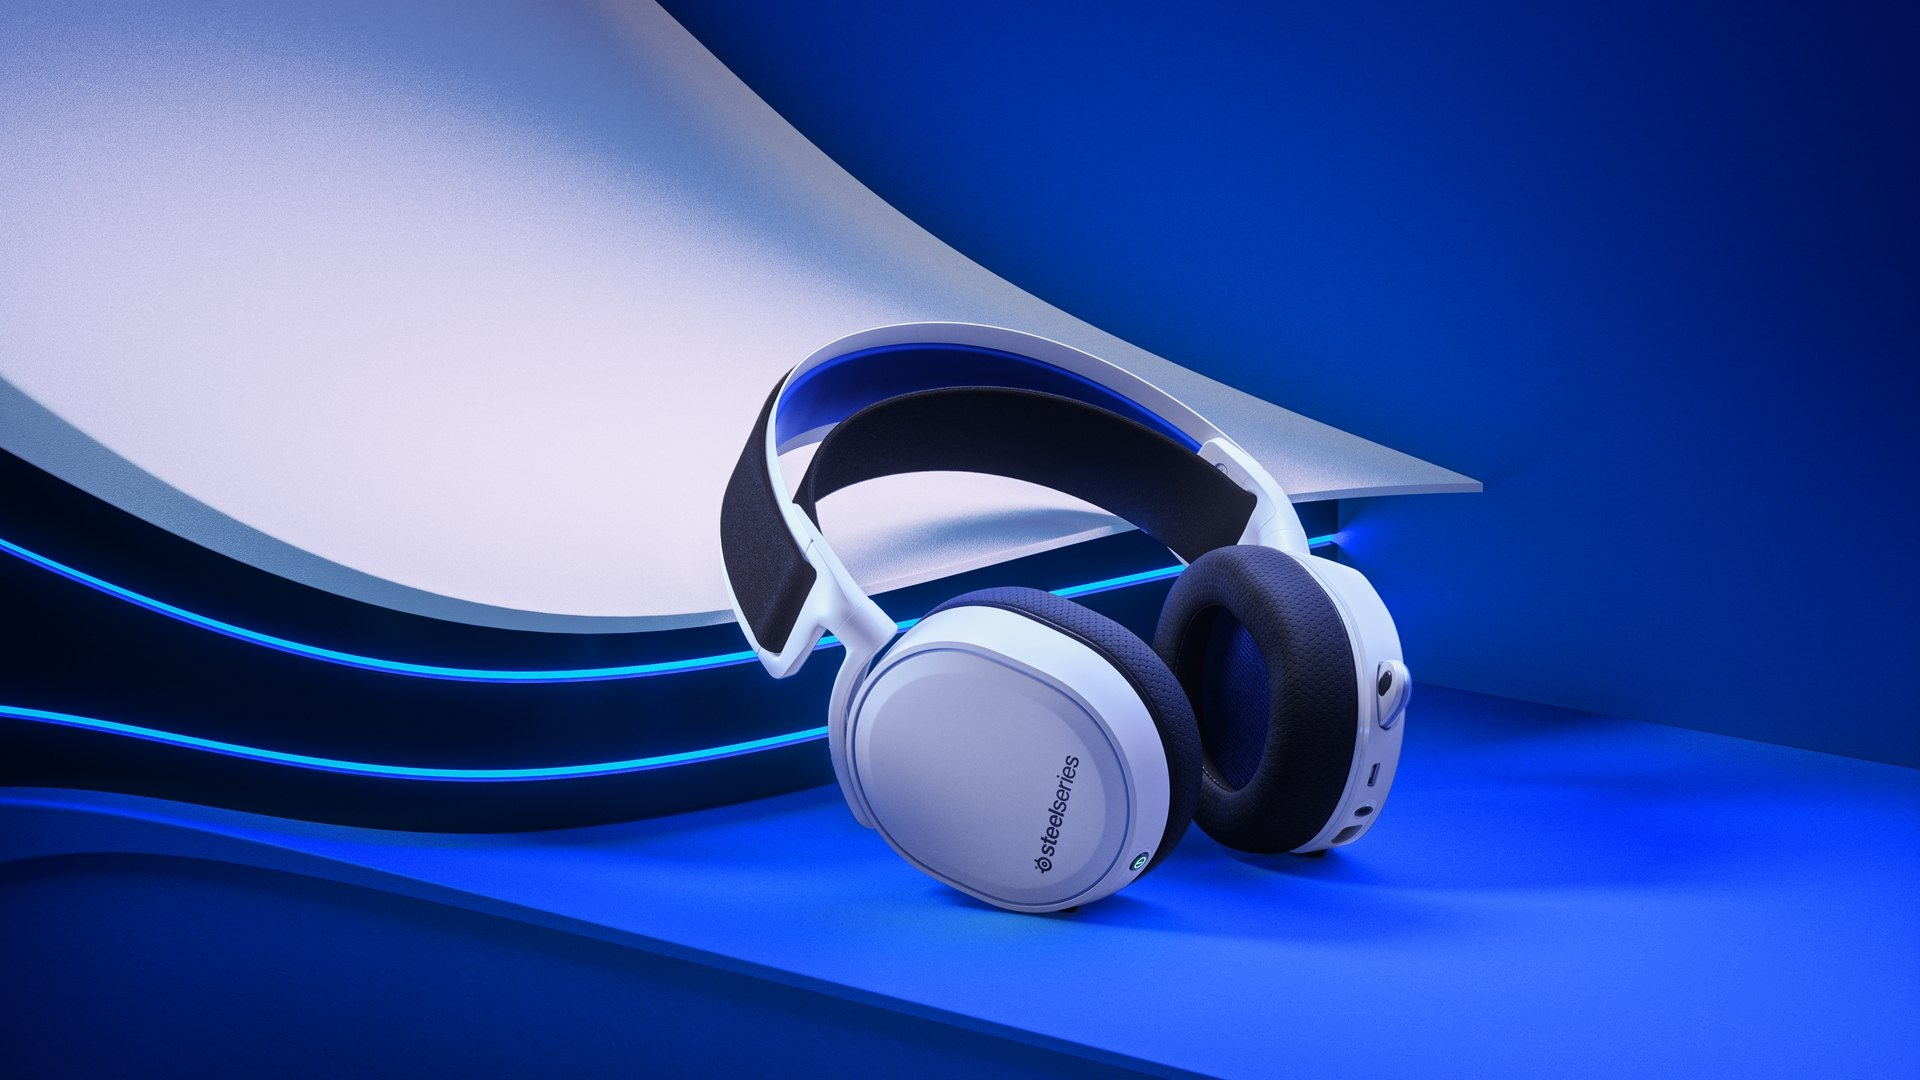 Playstation 4 ve 5 uyumlu kulaklık